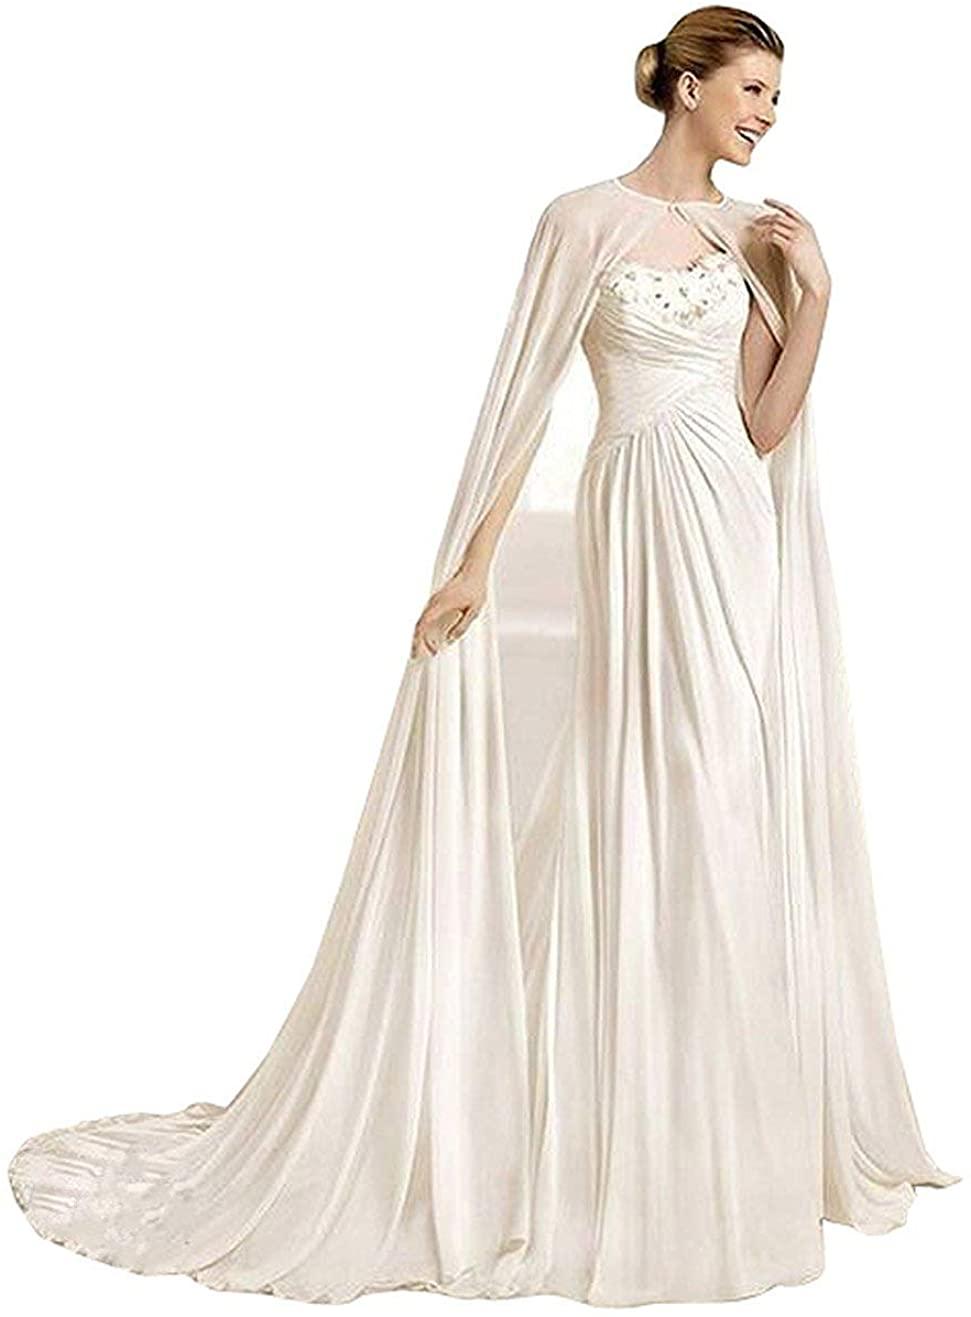 Women's 2 Meters Chiffon Wedding Long Cape Cathedral Length Bridal Cloak Bride Cape